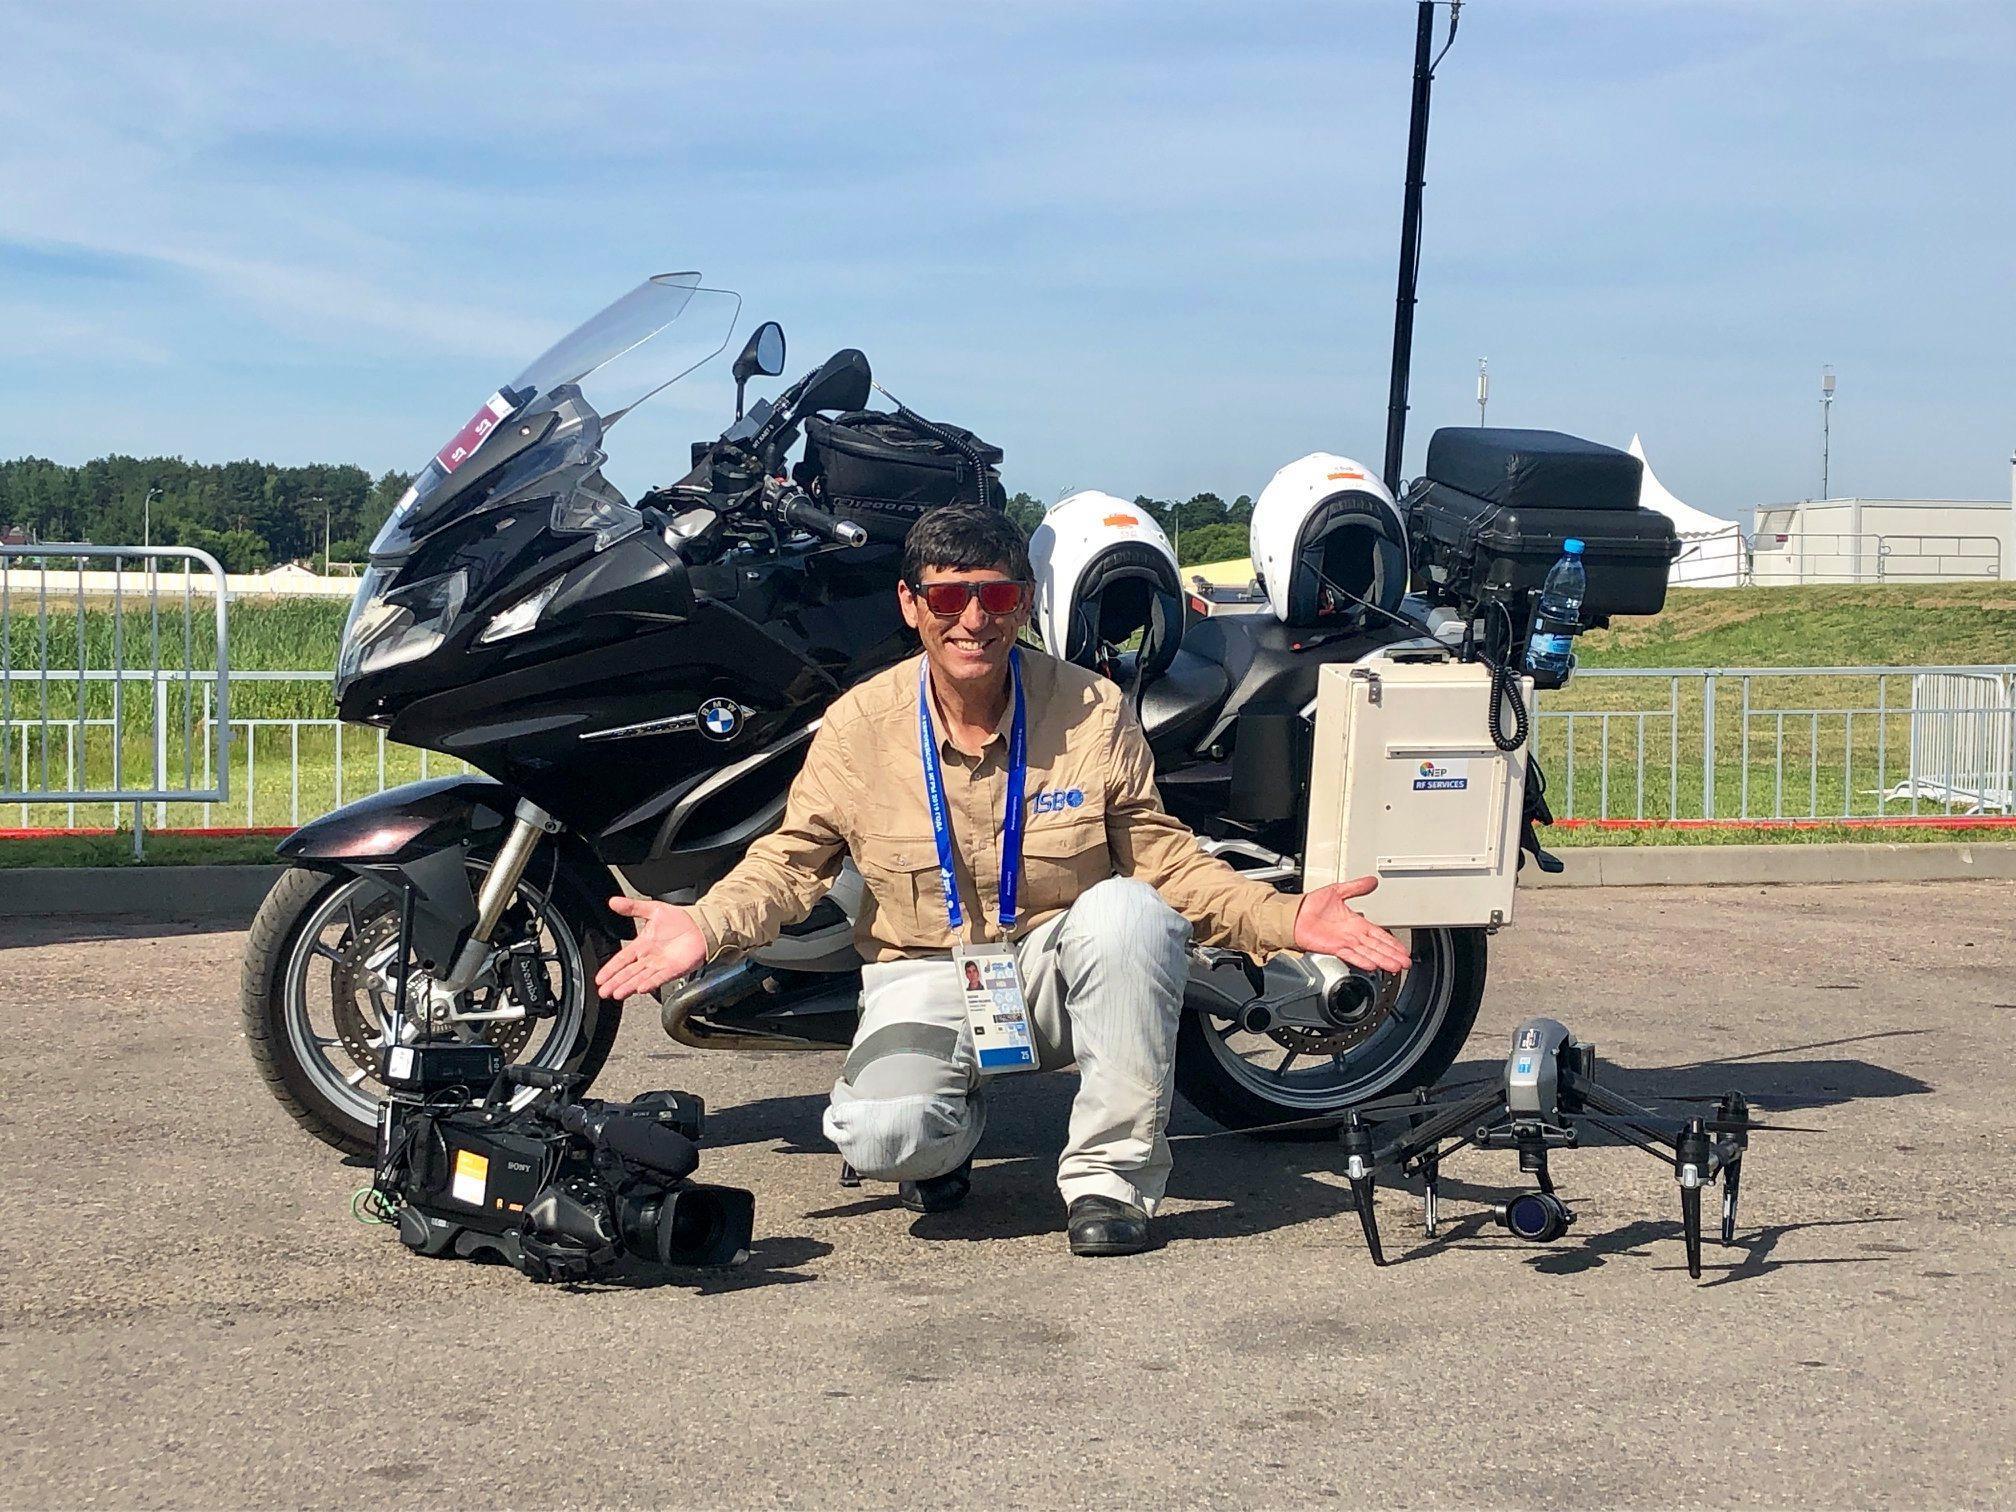 Viajes en Moto por Pirineos